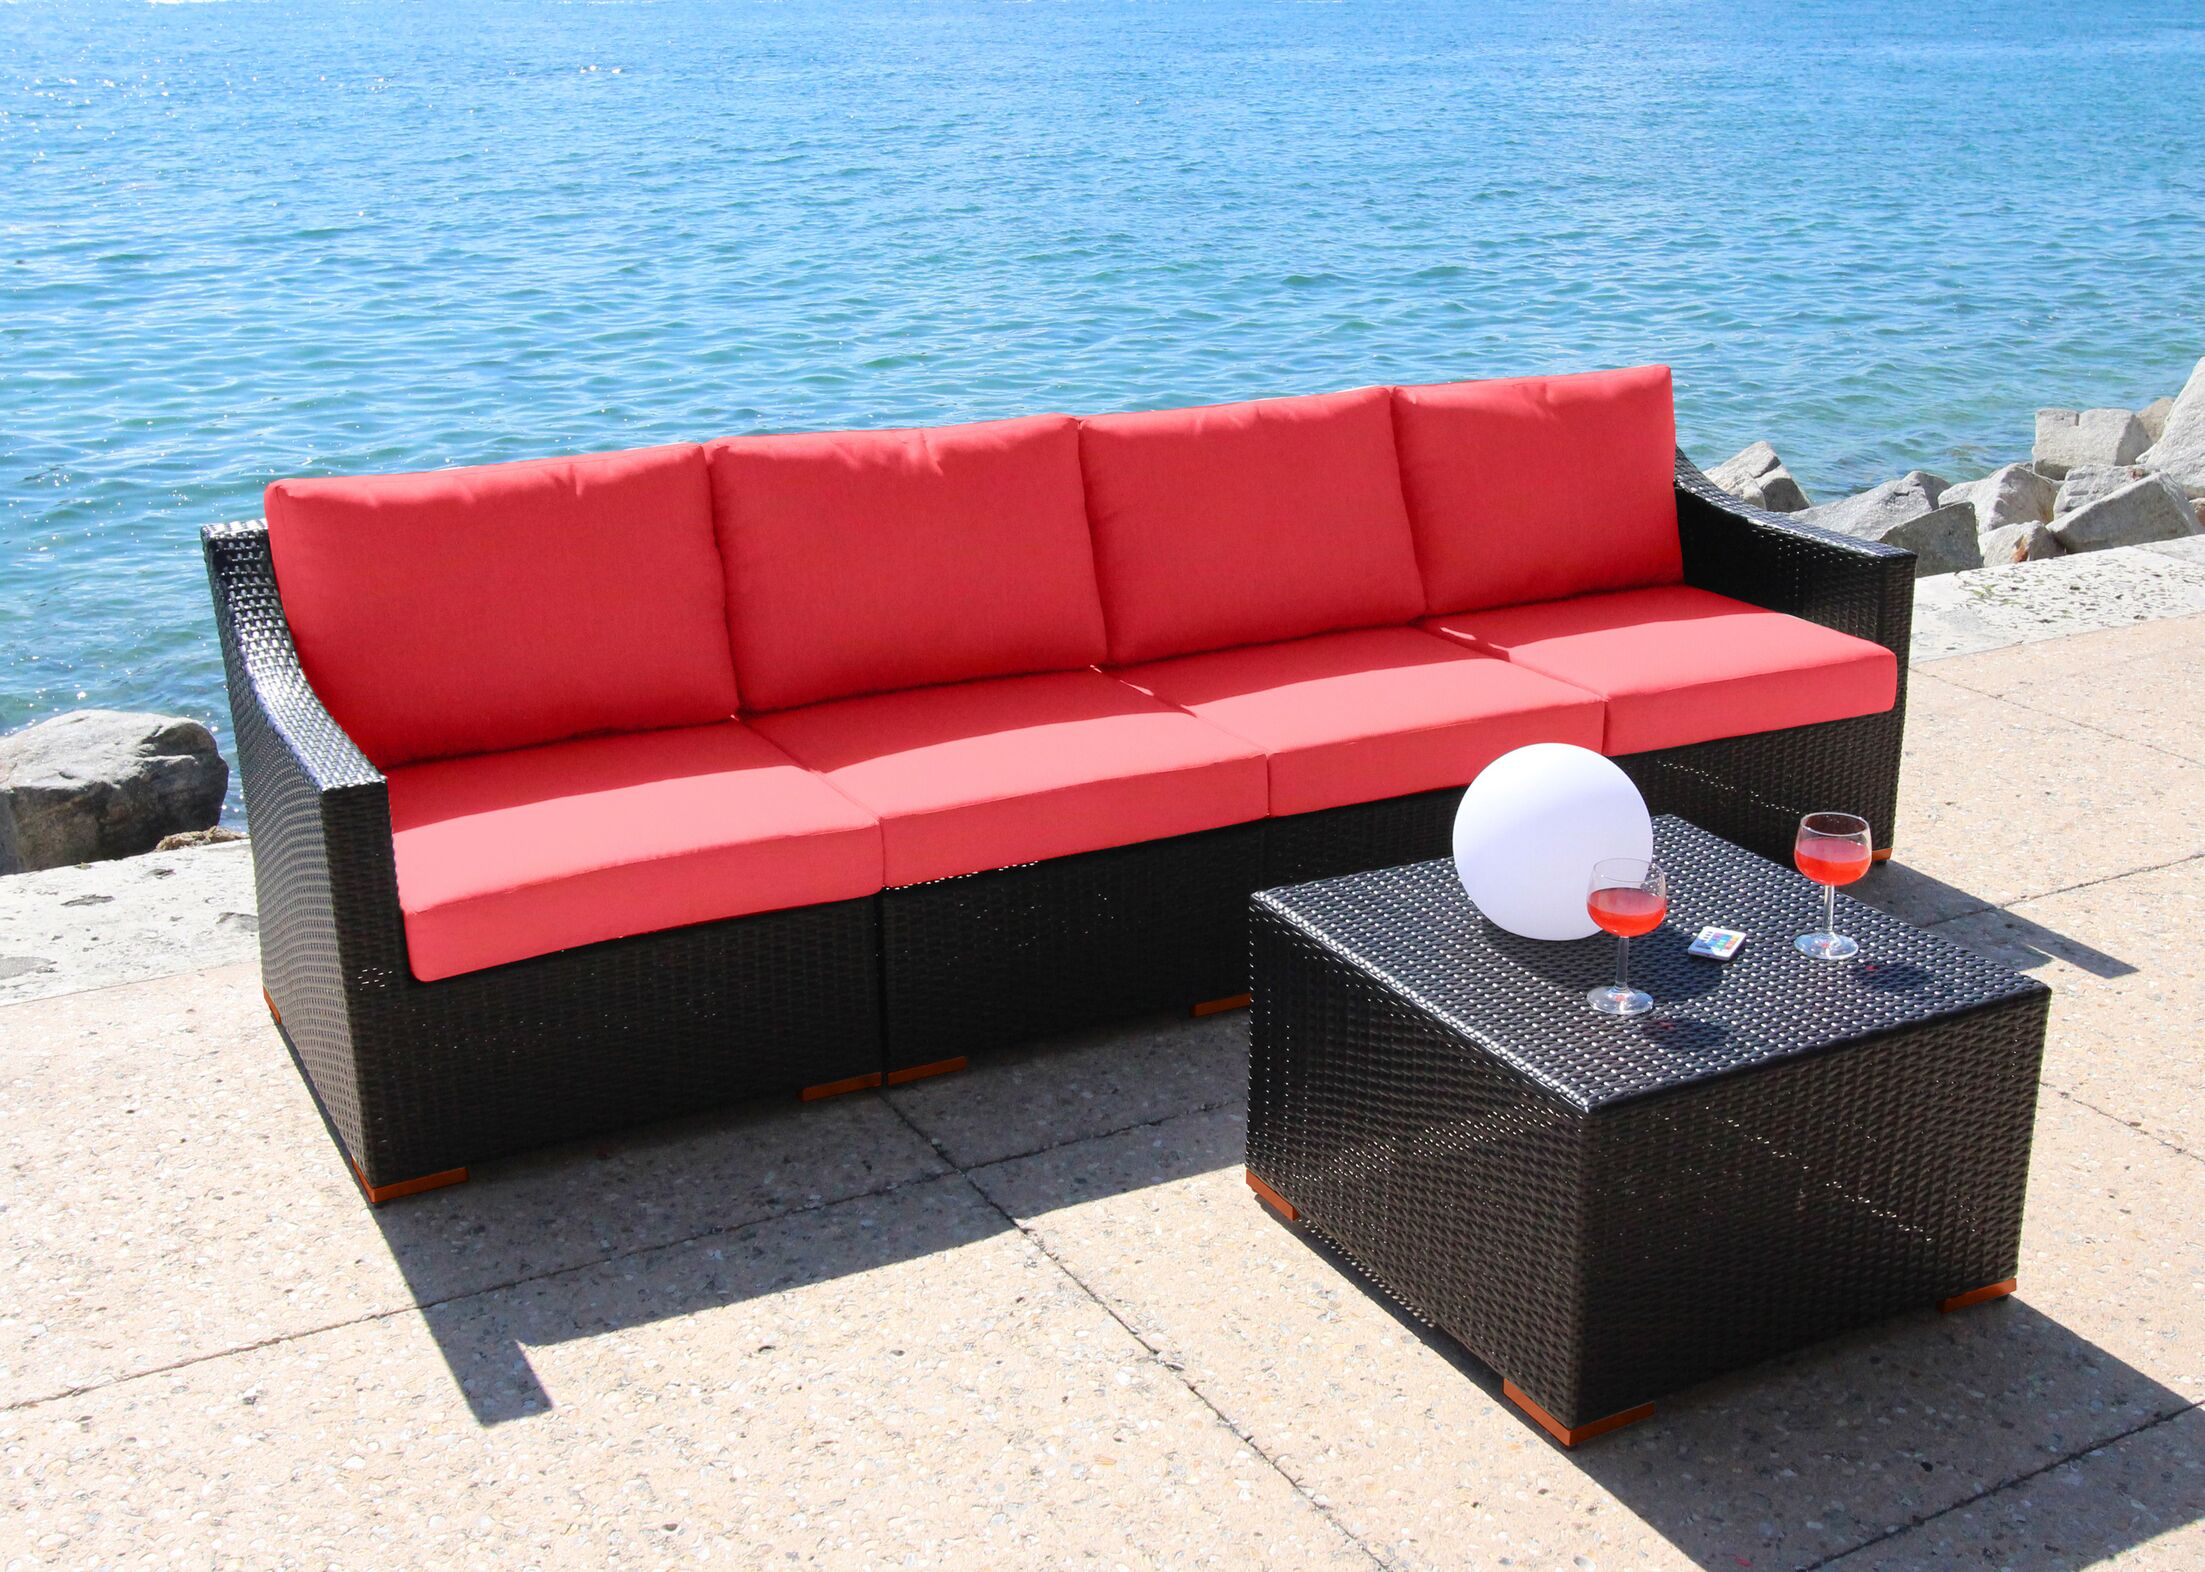 Marcelo 5 Piece Sofa Set Fabric: Dura-Fast Red